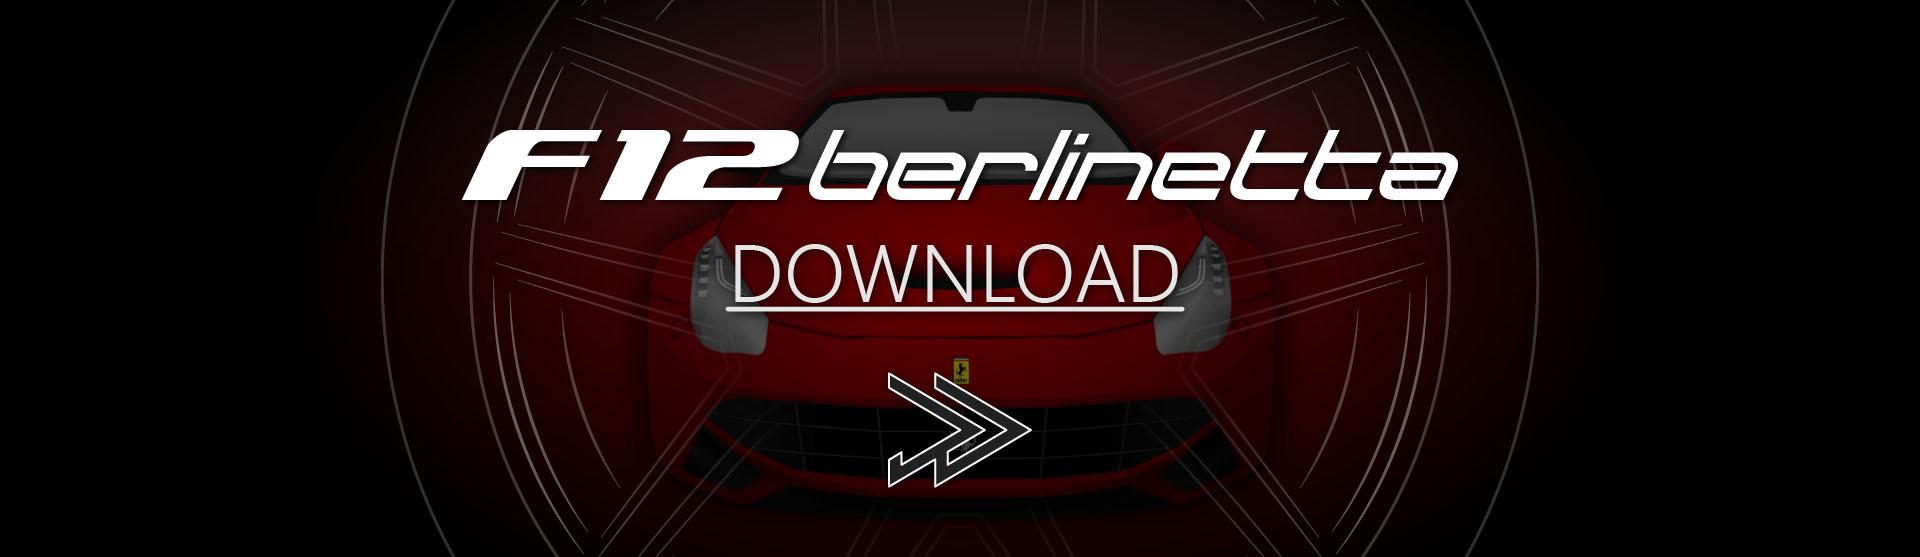 F12 Download